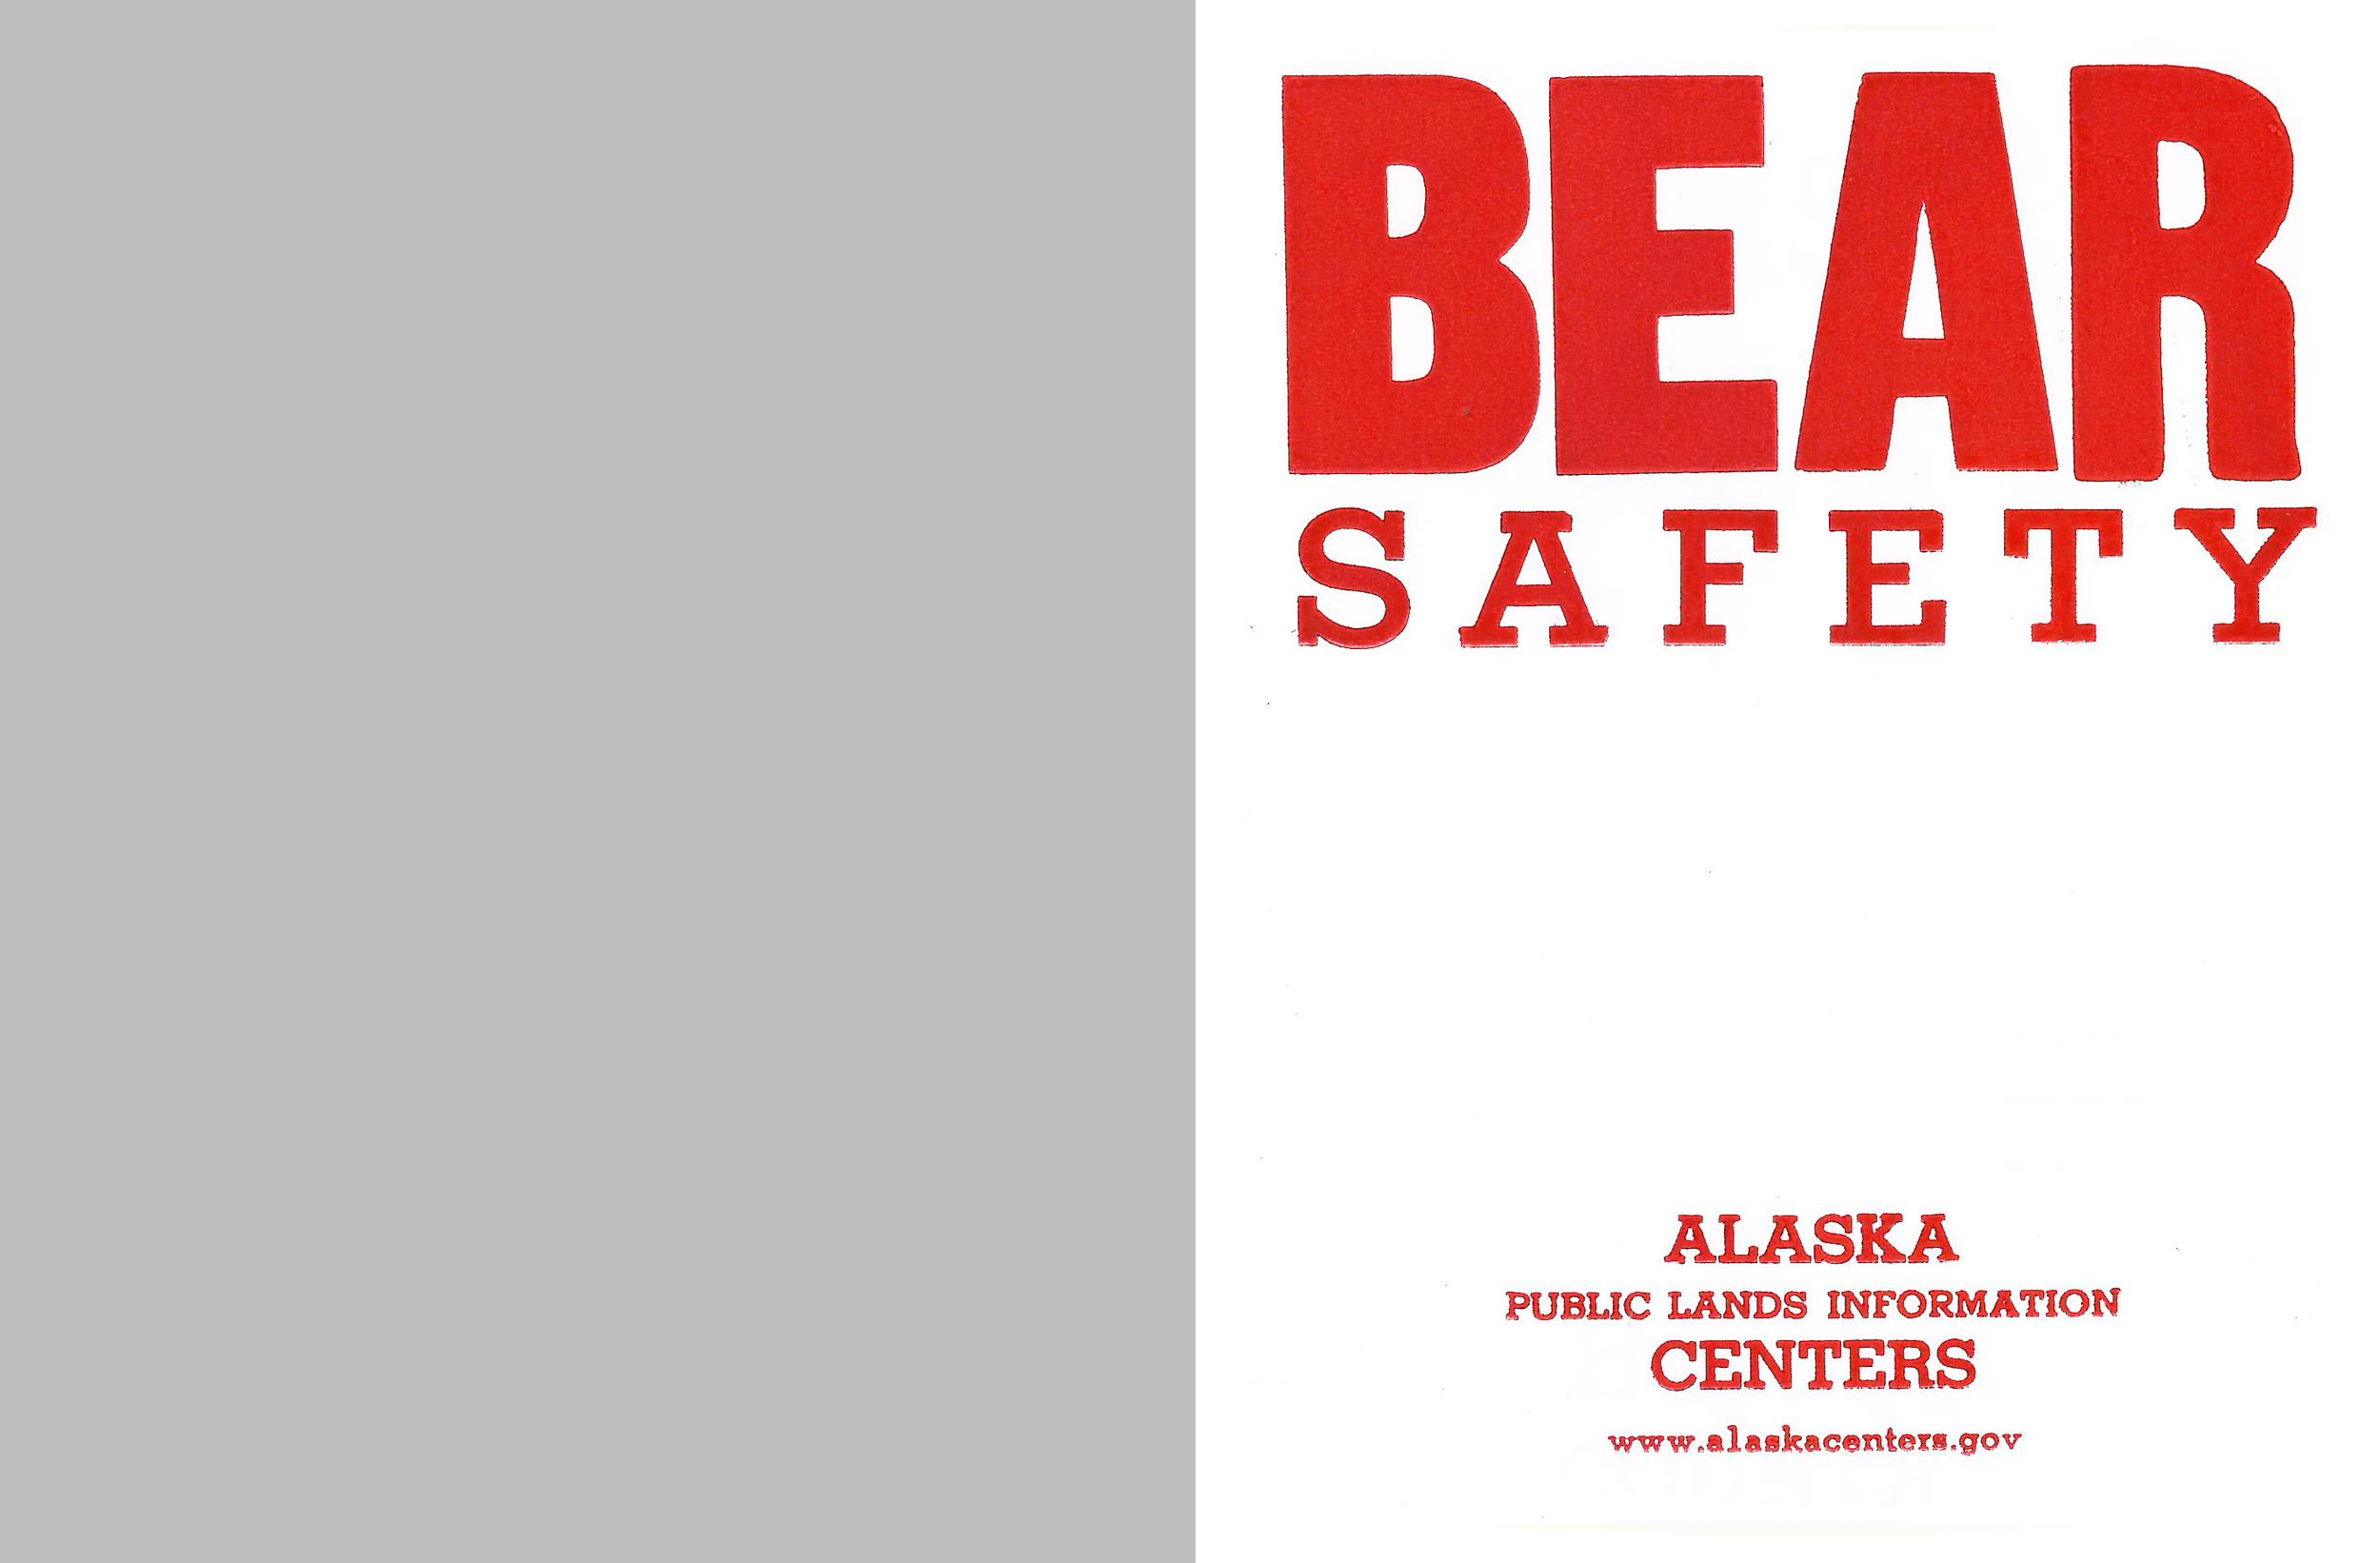 BEAR SAFETY.jpg